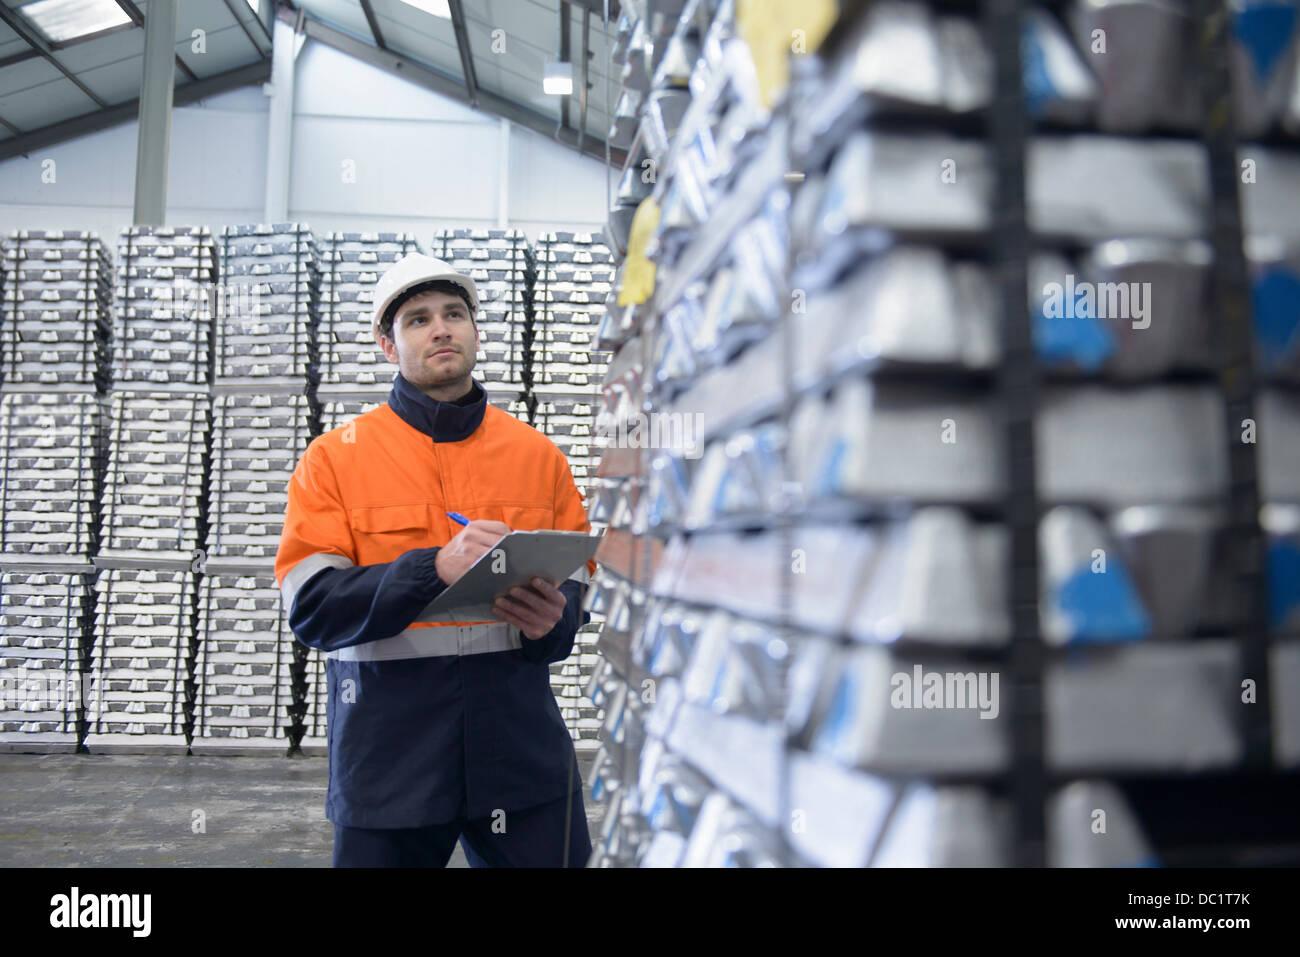 Trabajador de almacén control de stock Imagen De Stock